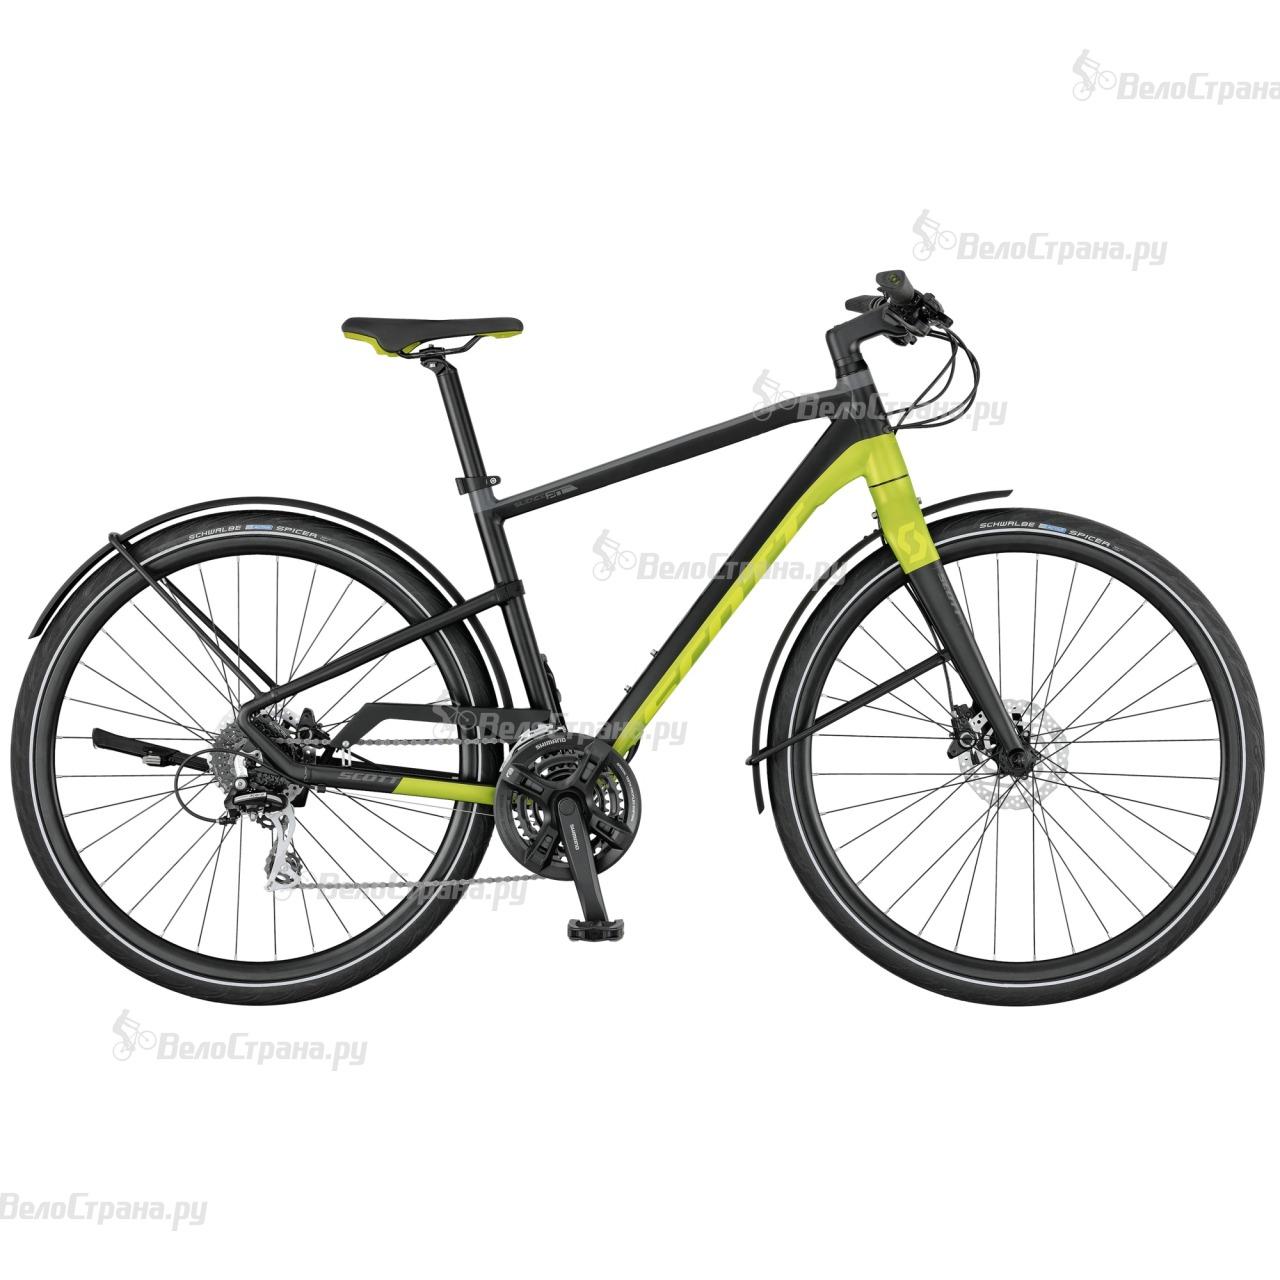 Велосипед Scott Silence Speed 20 Men (2017) велосипед scott e silence evo 2017